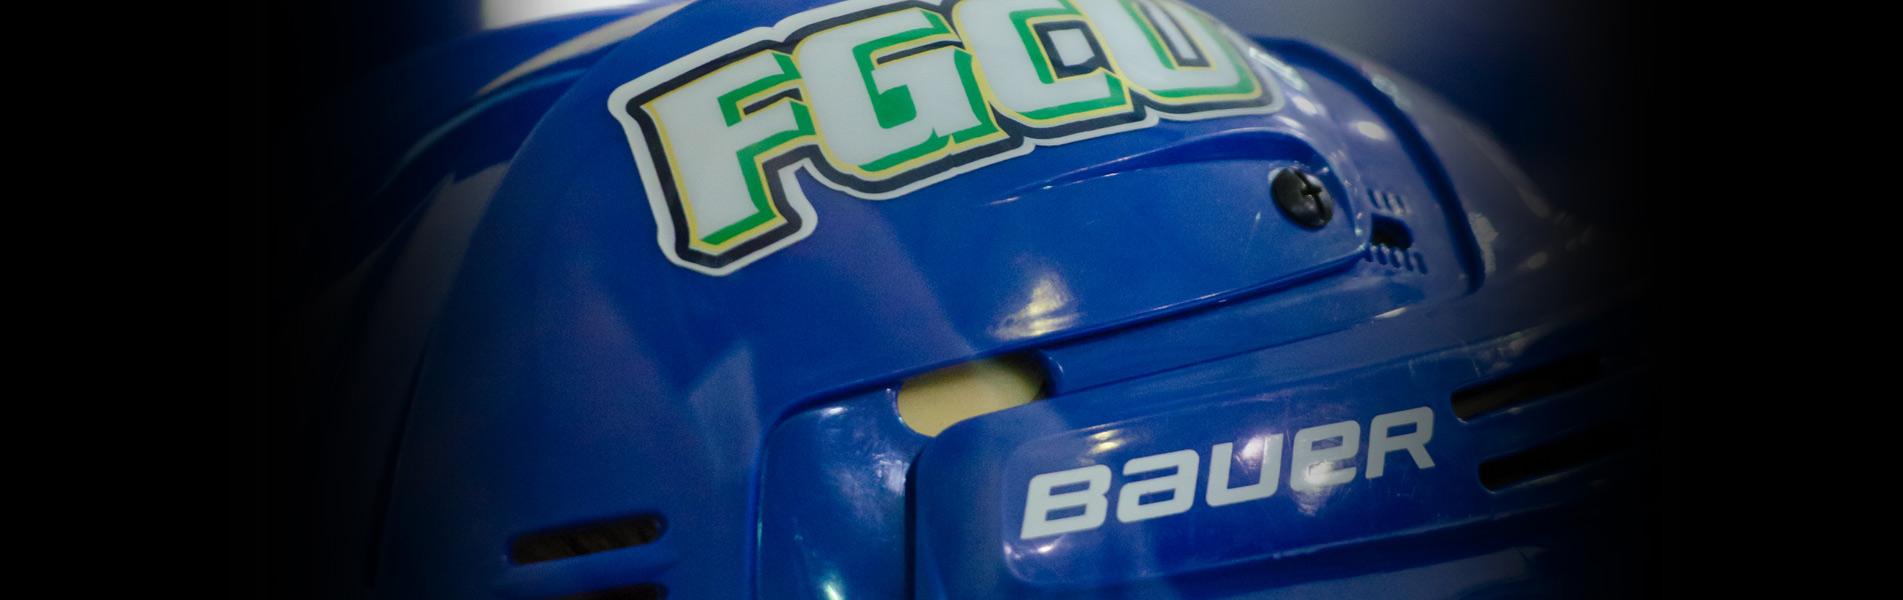 FGCU Hockey Club - helmet